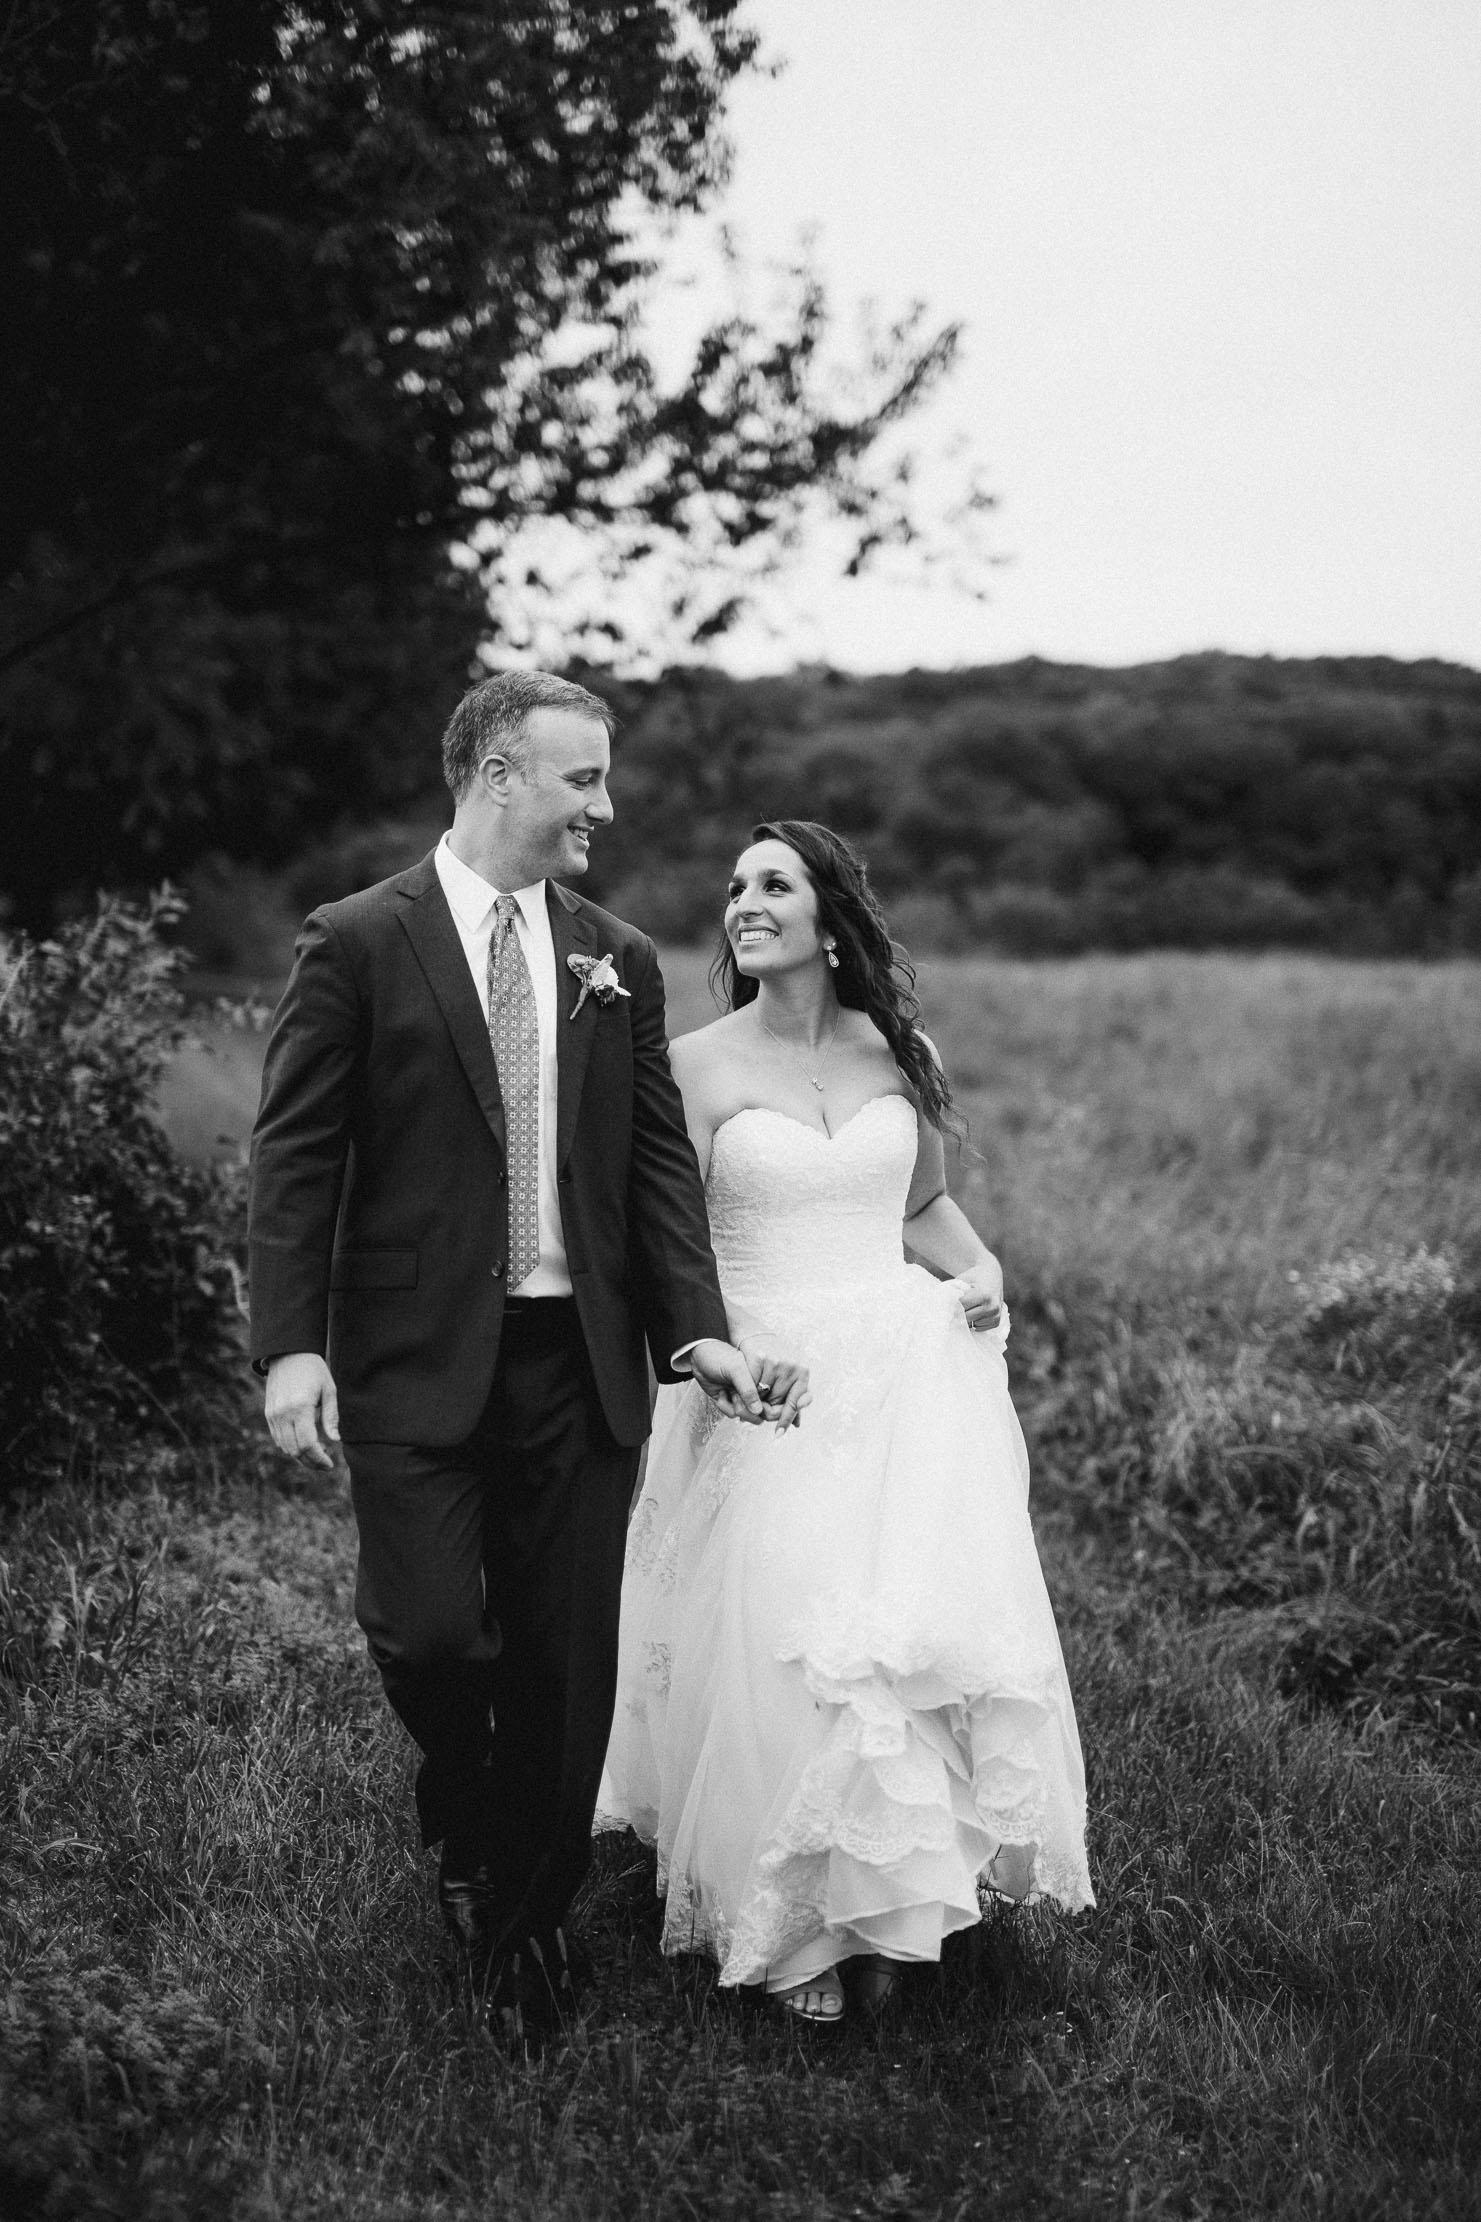 Wings-Castle-Millbrook-NY-Upstate-Wedding-Photographer-1054.jpg